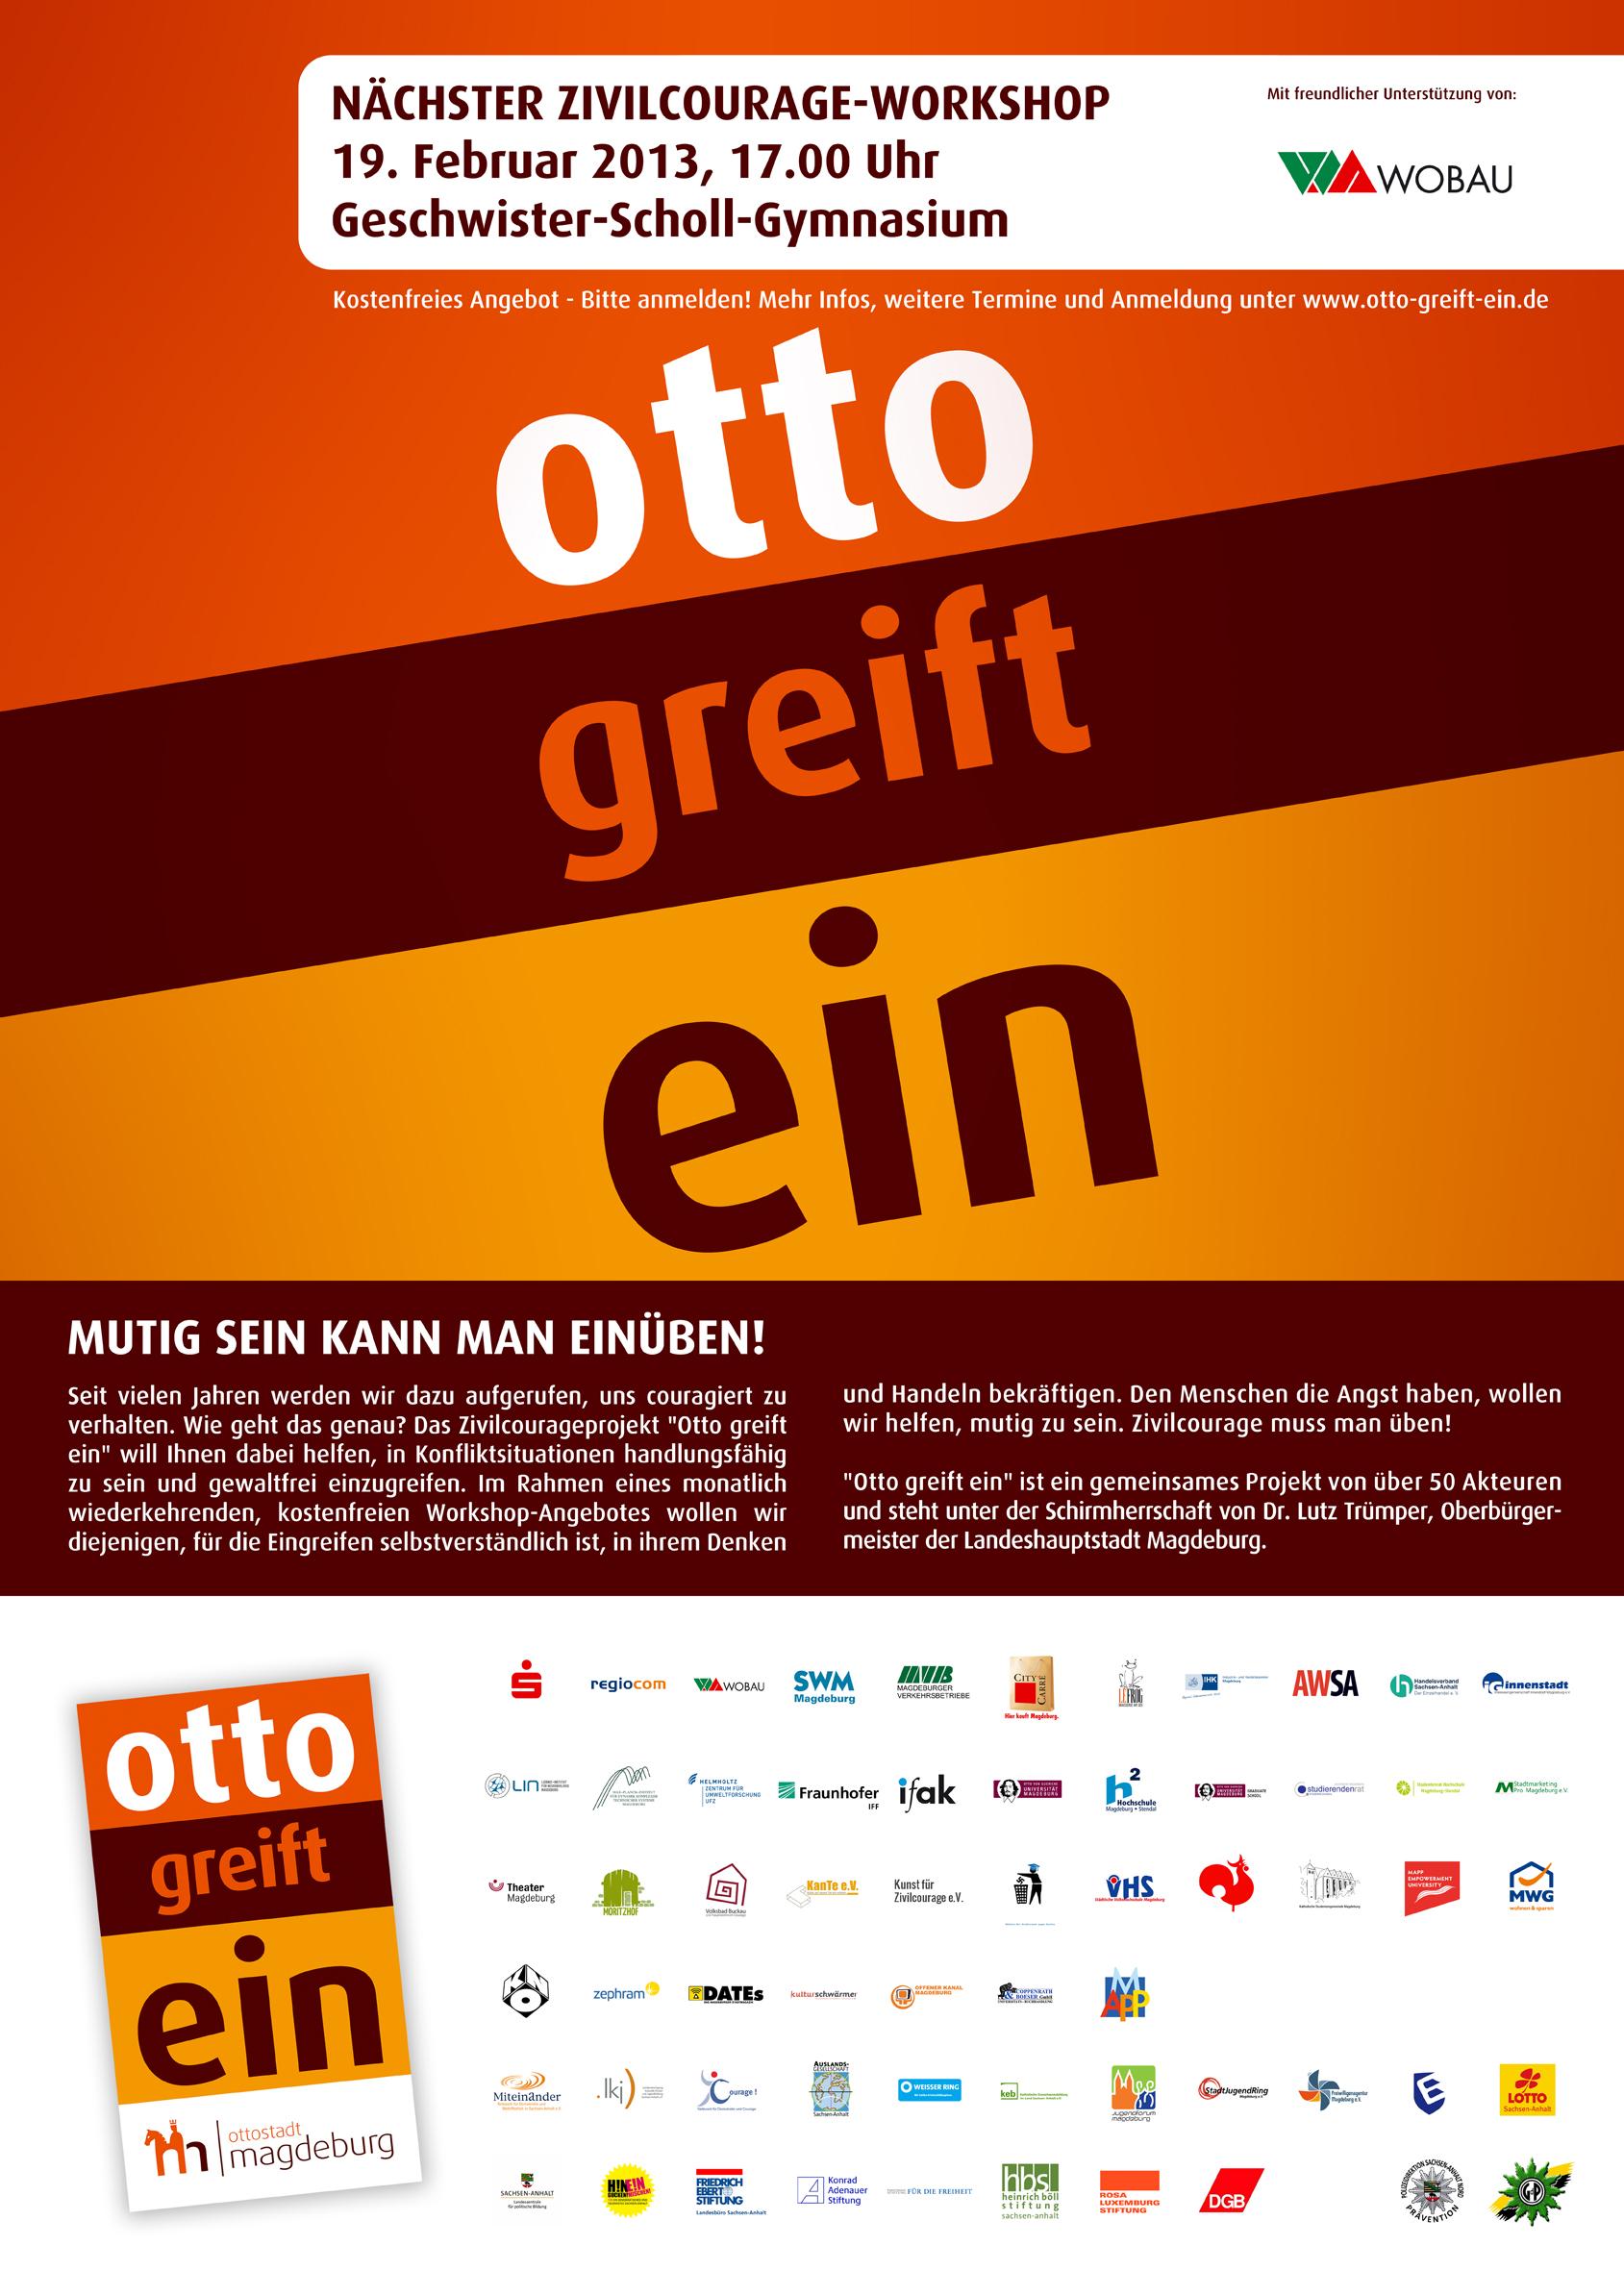 otto-greift-ein_plakat-FEBRUAR